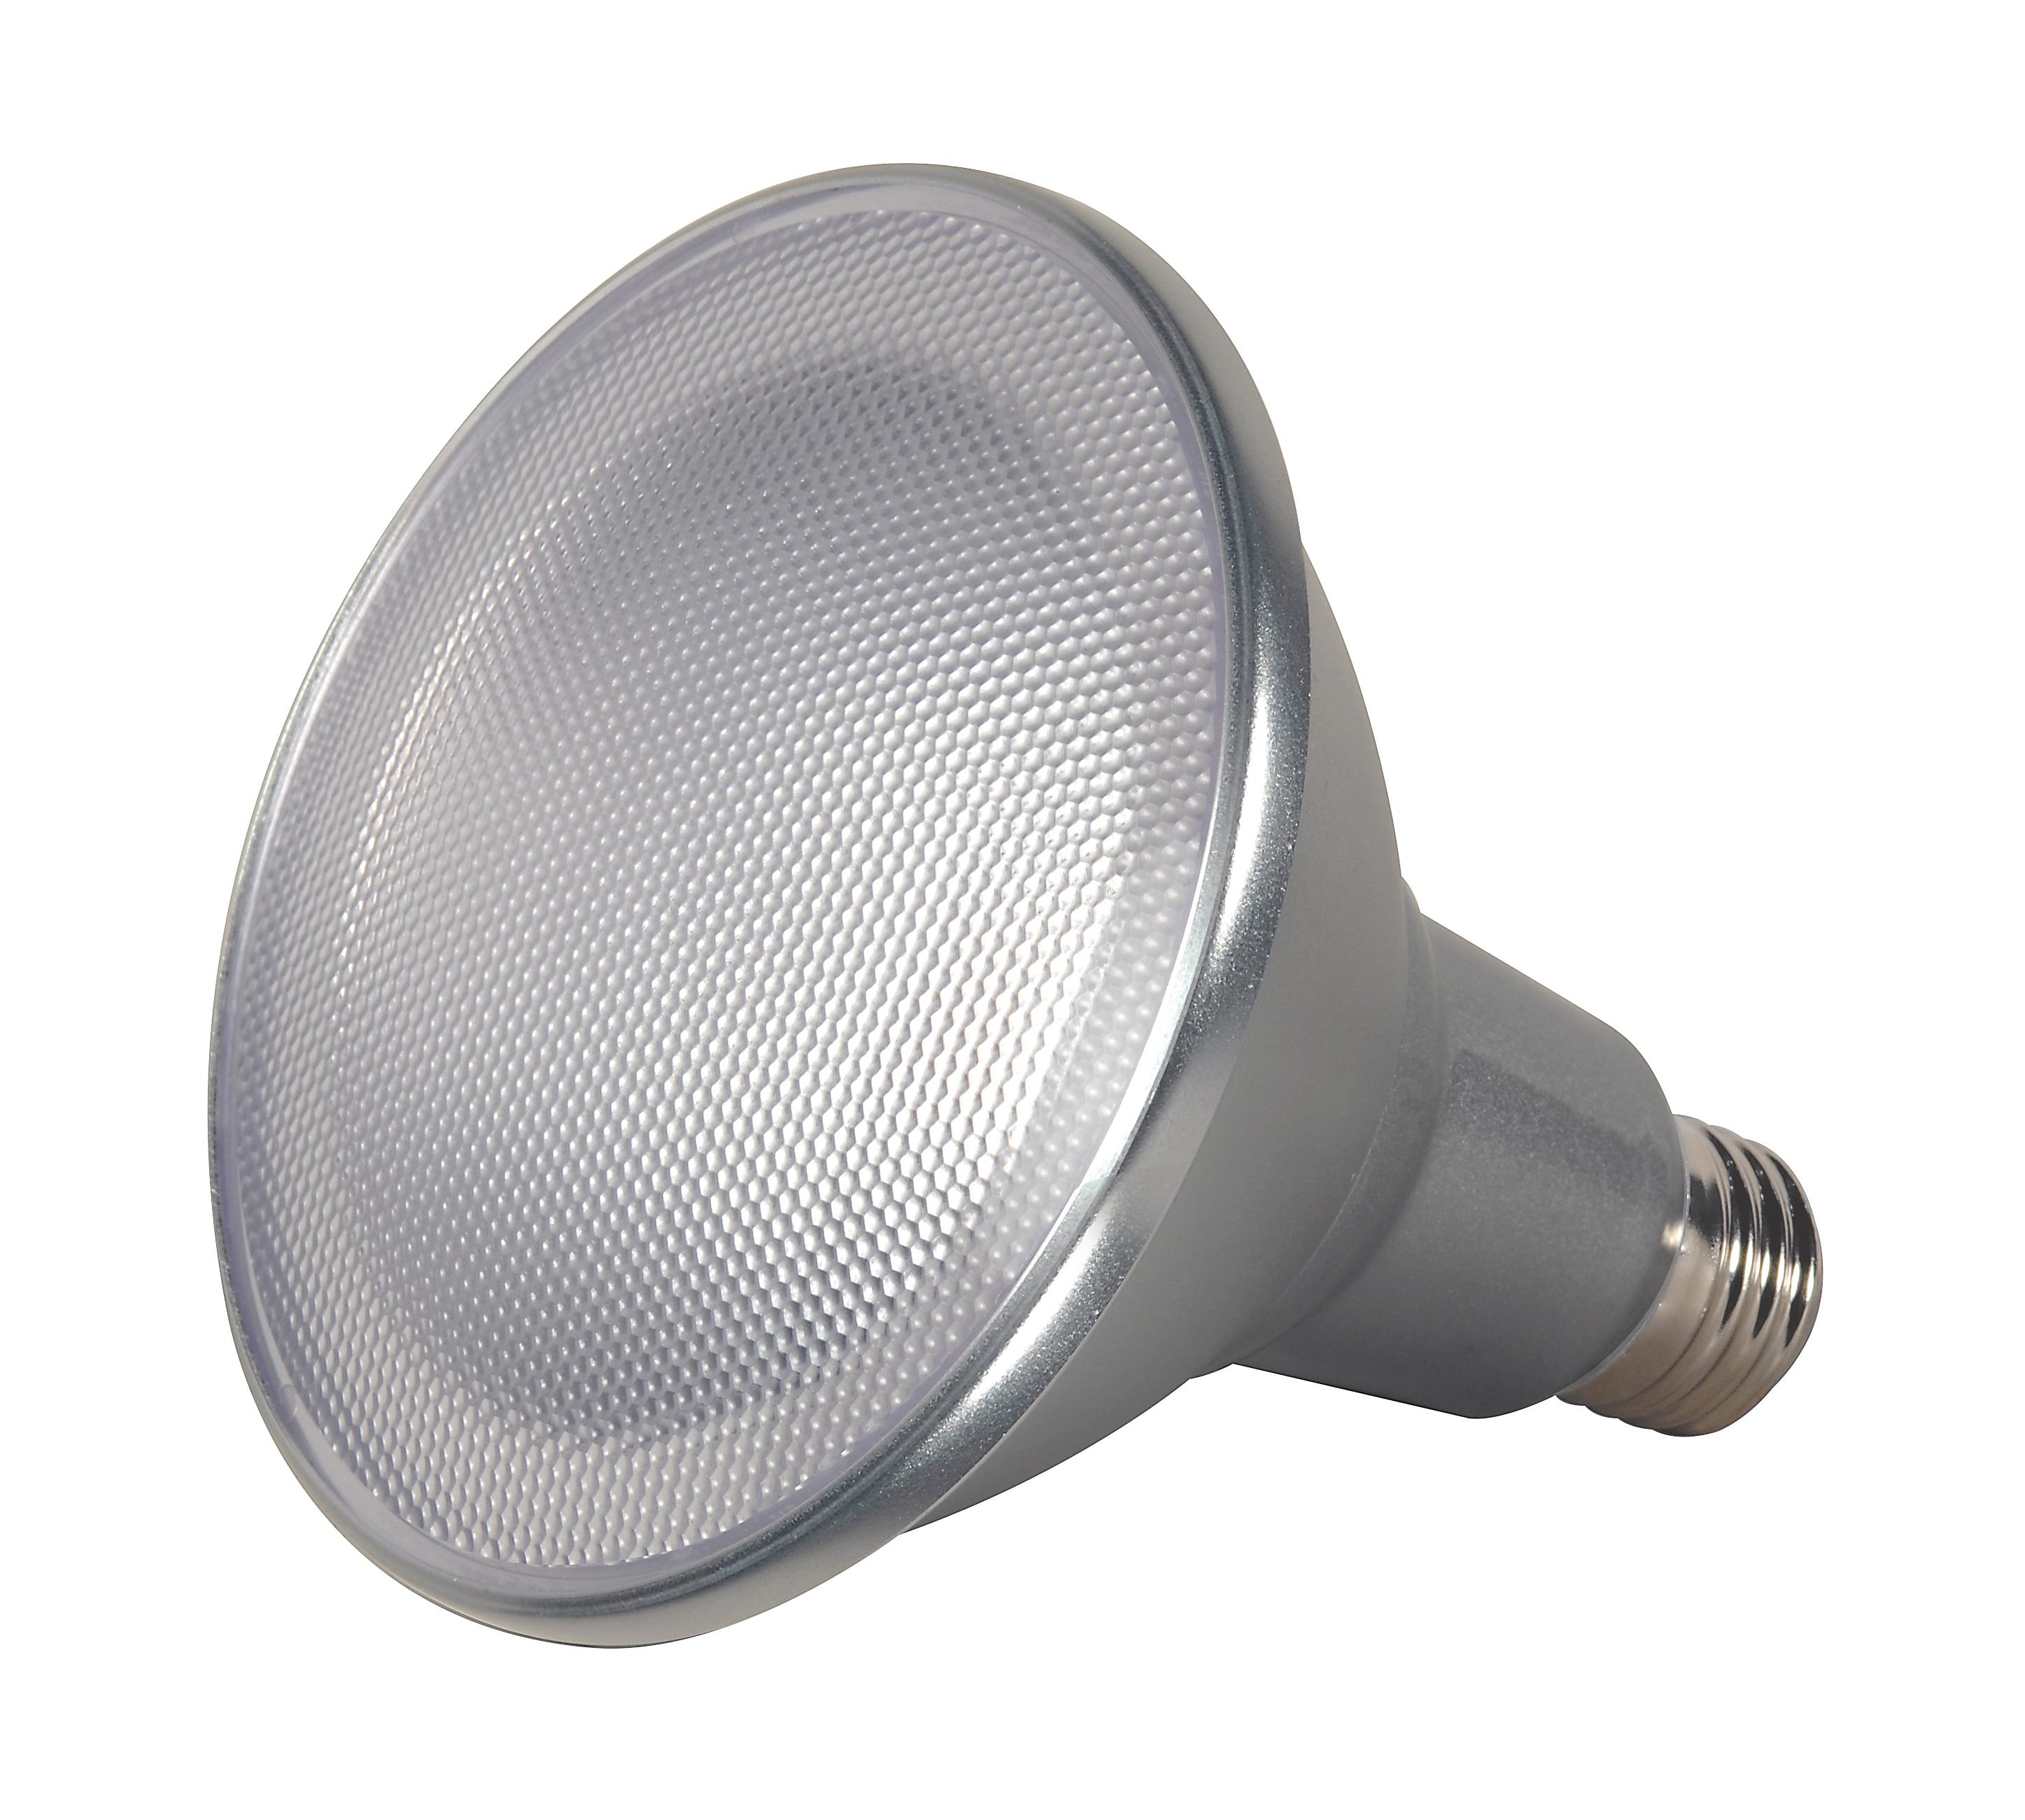 SATCO S9447 15W LAMP PAR38 LED FLOOD 3500K 40FT BEAM SPREAD MEDIUM BASE 120V